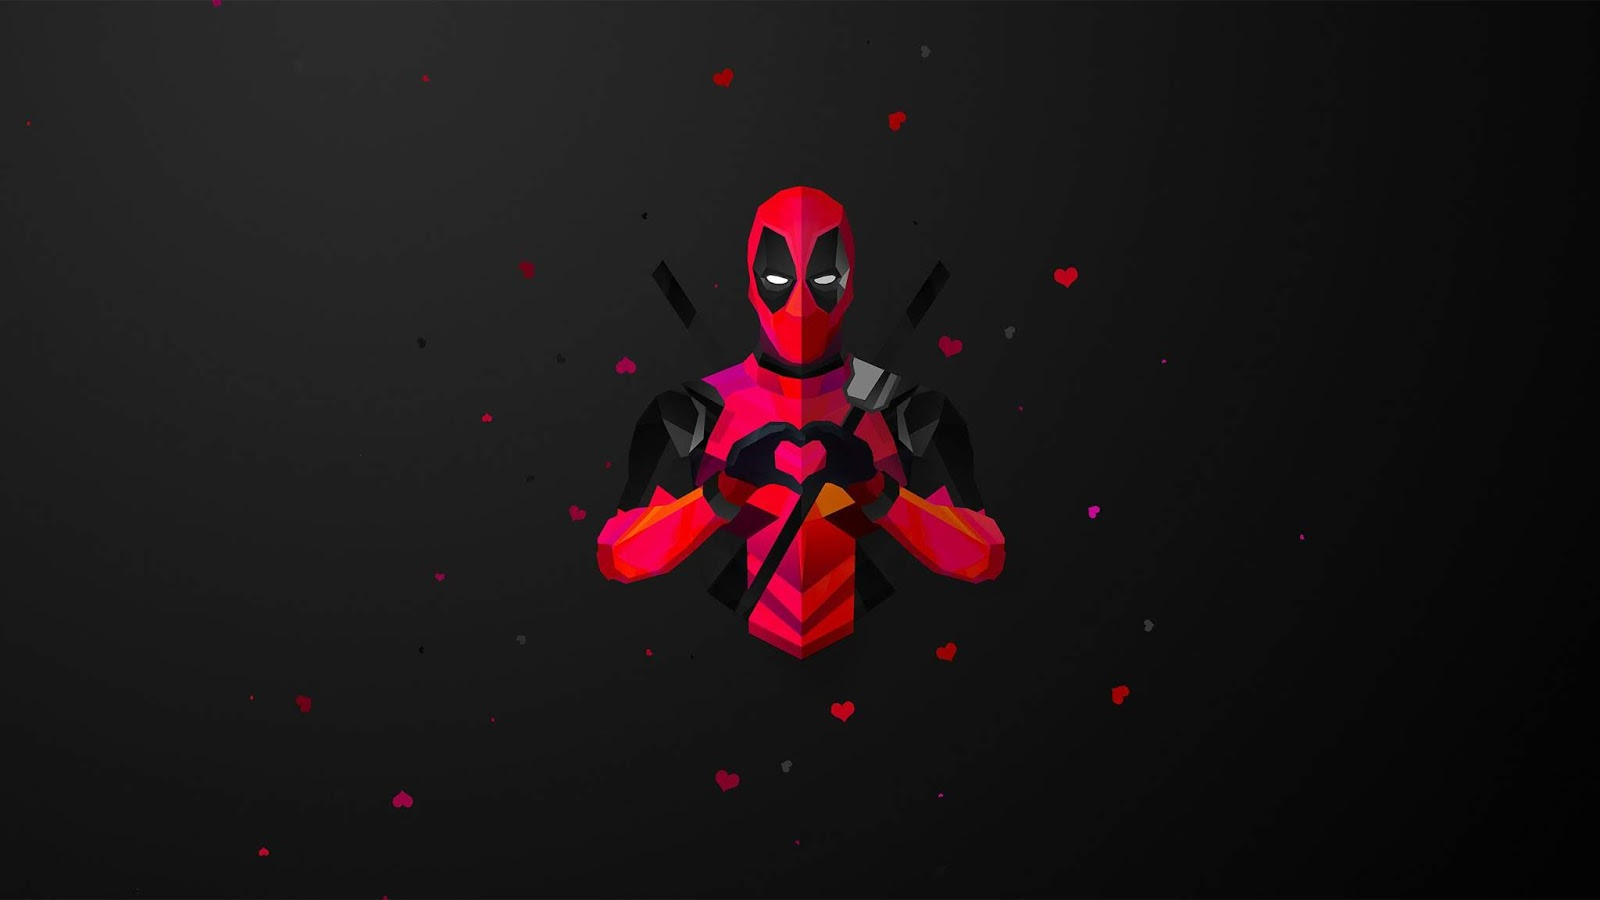 Deadpool Hd Wallpaper Hd Image Logo Free Download